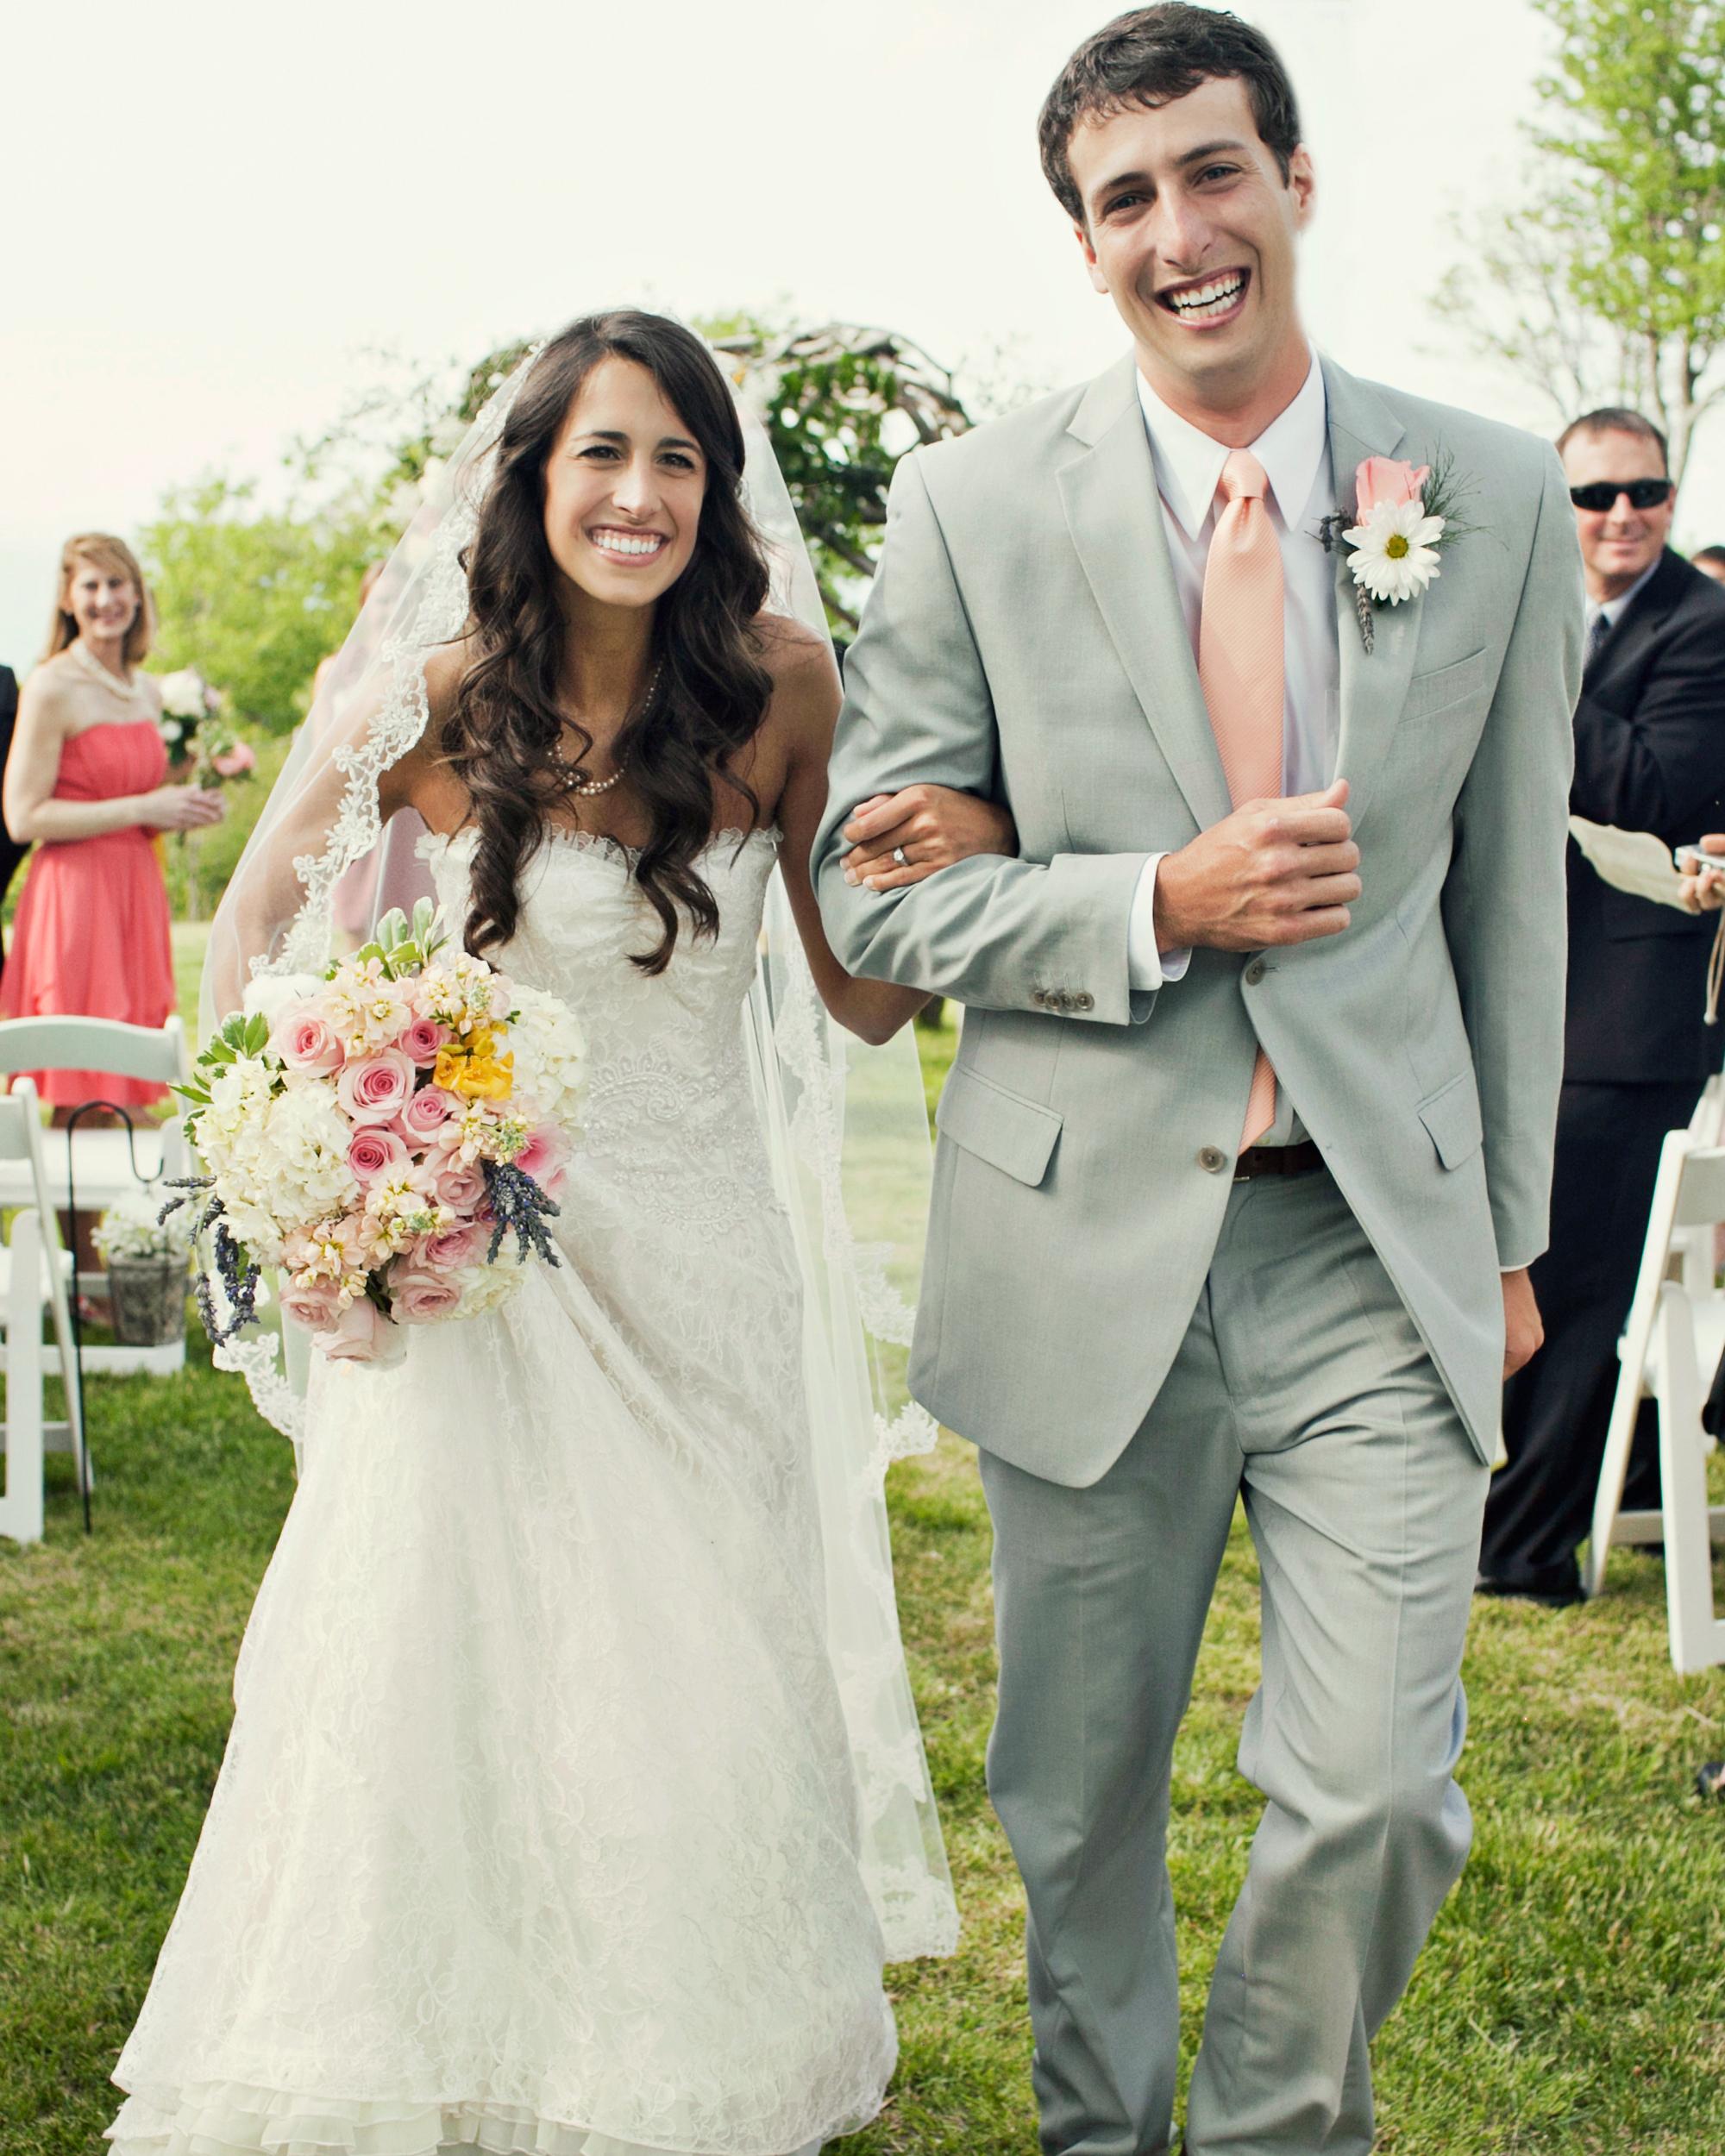 real-weddings-abby-julian-0711-332.jpg